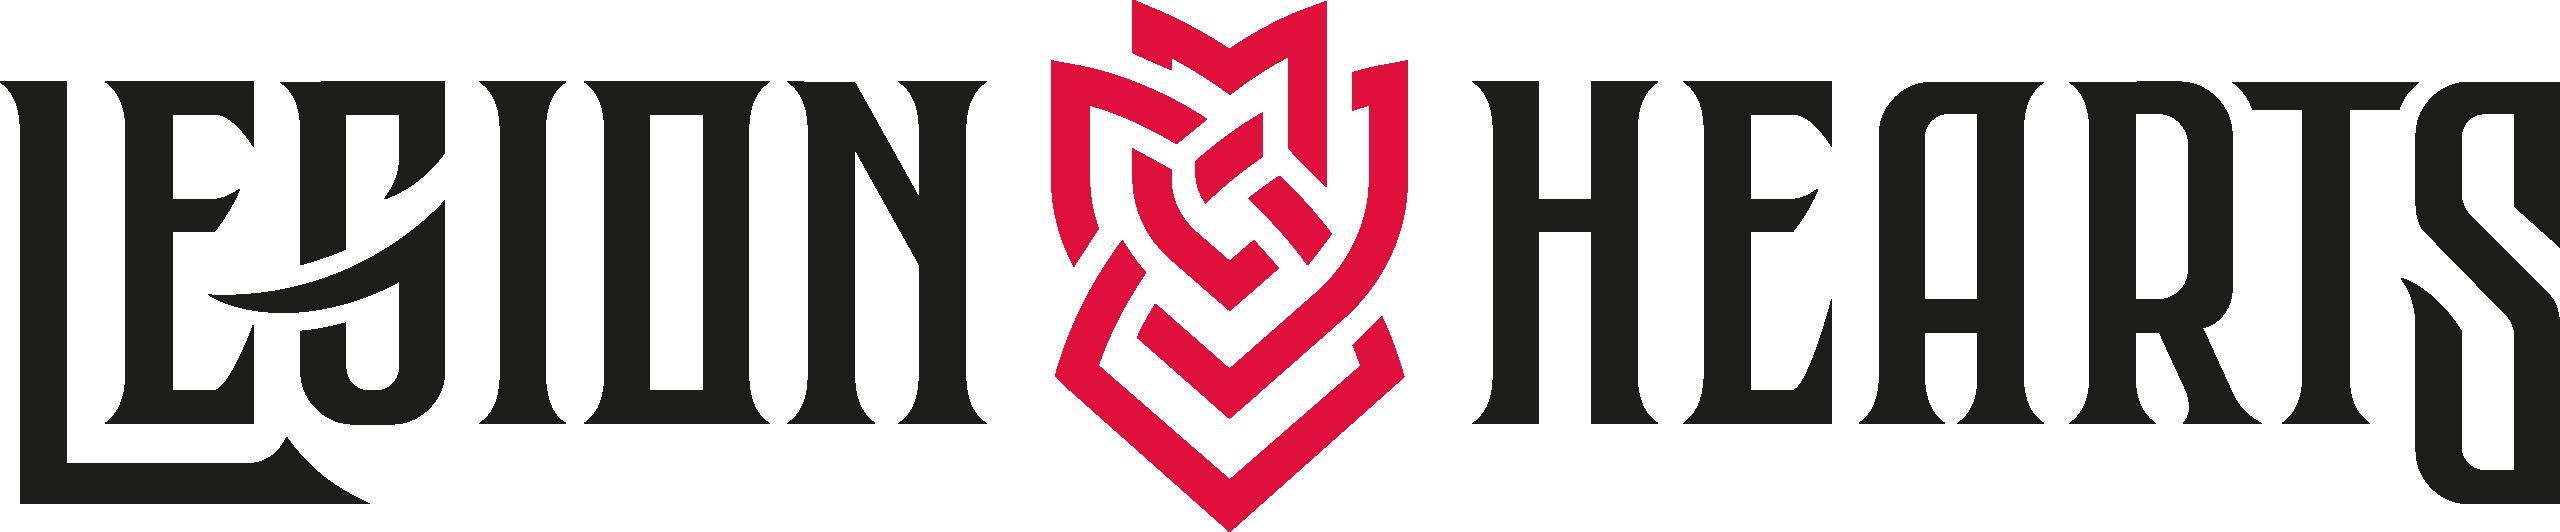 LH logo line Black